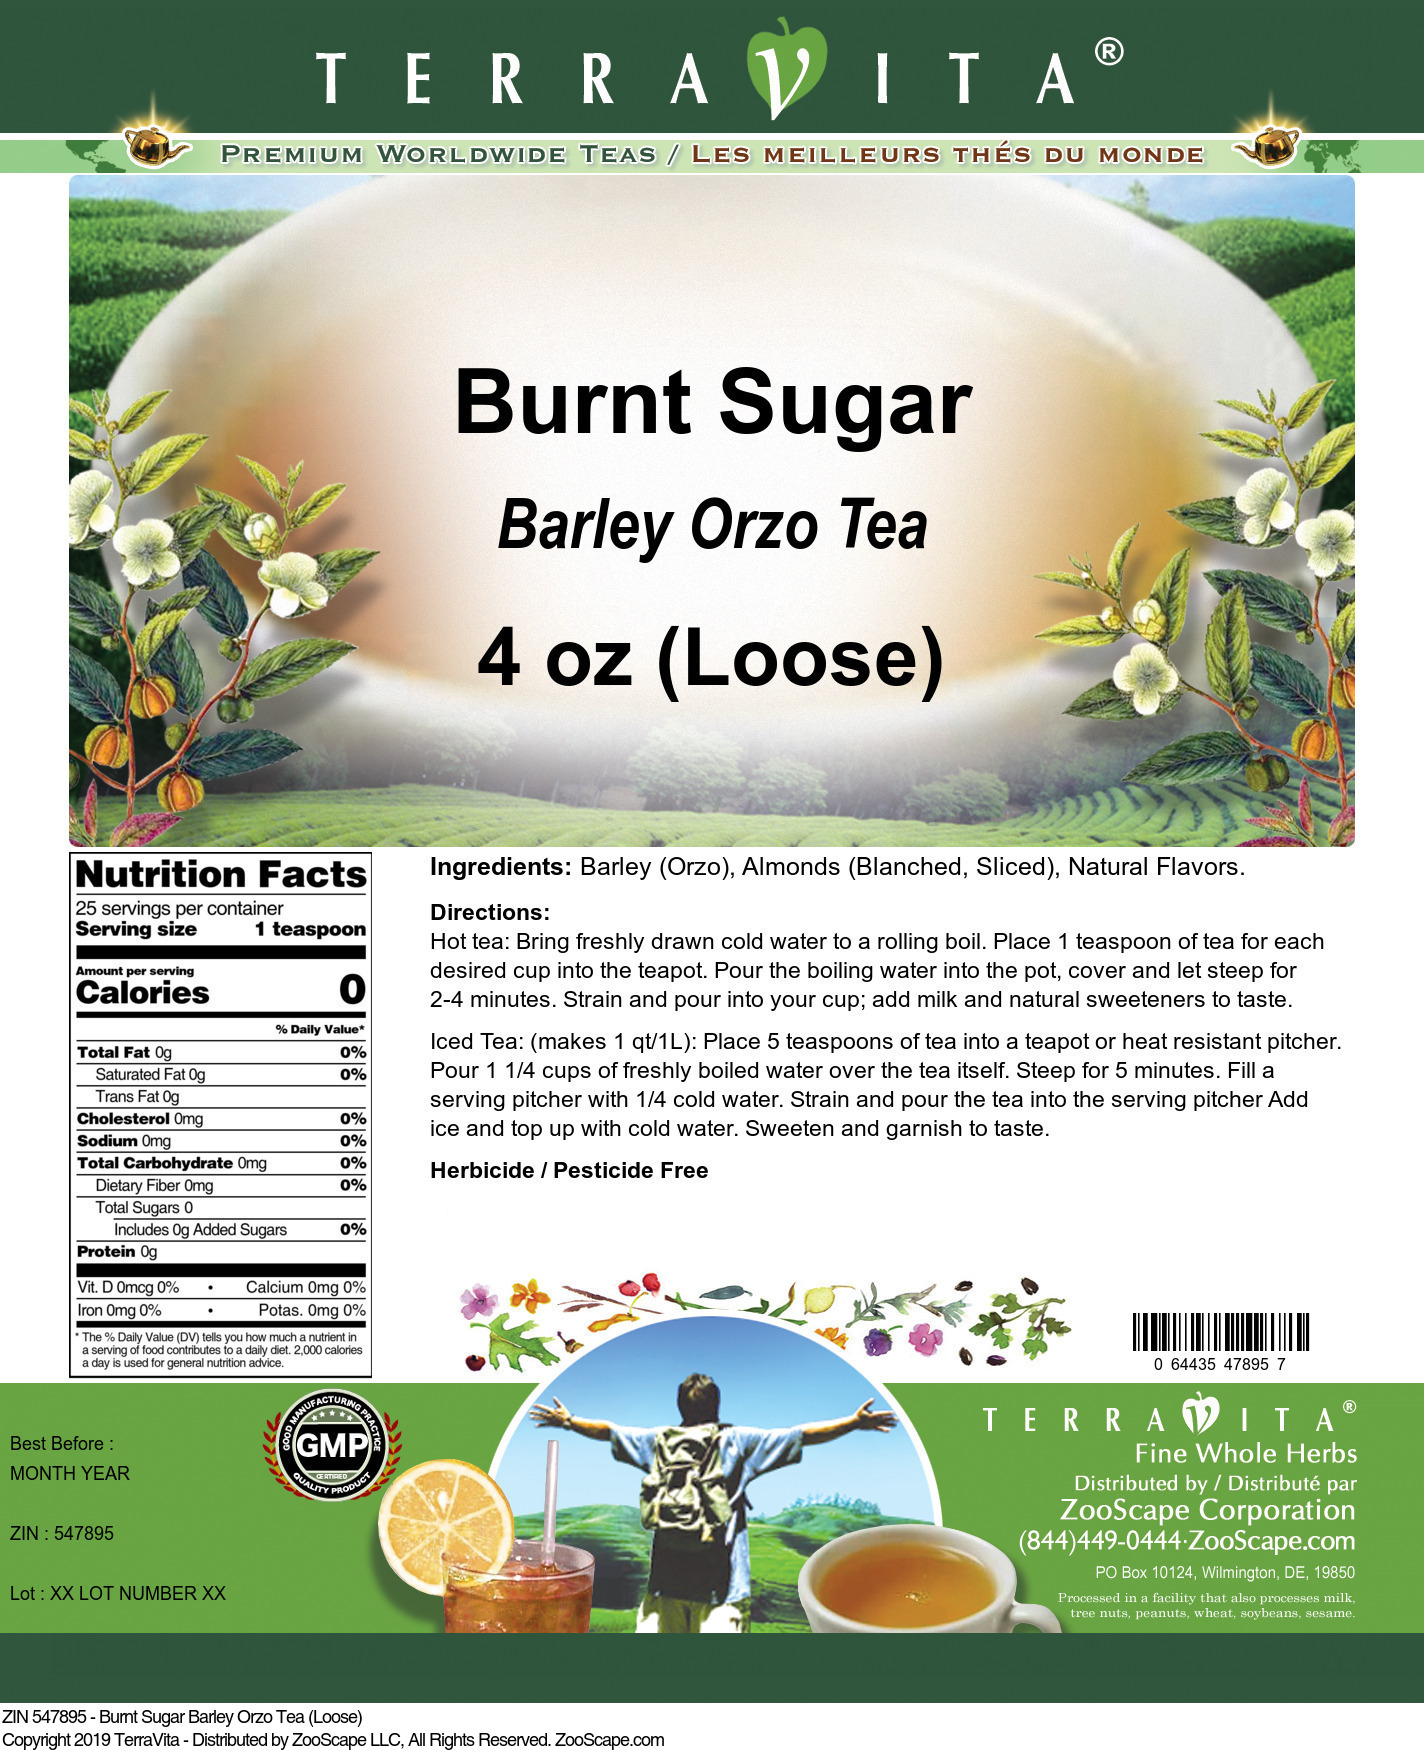 Burnt Sugar Barley Orzo